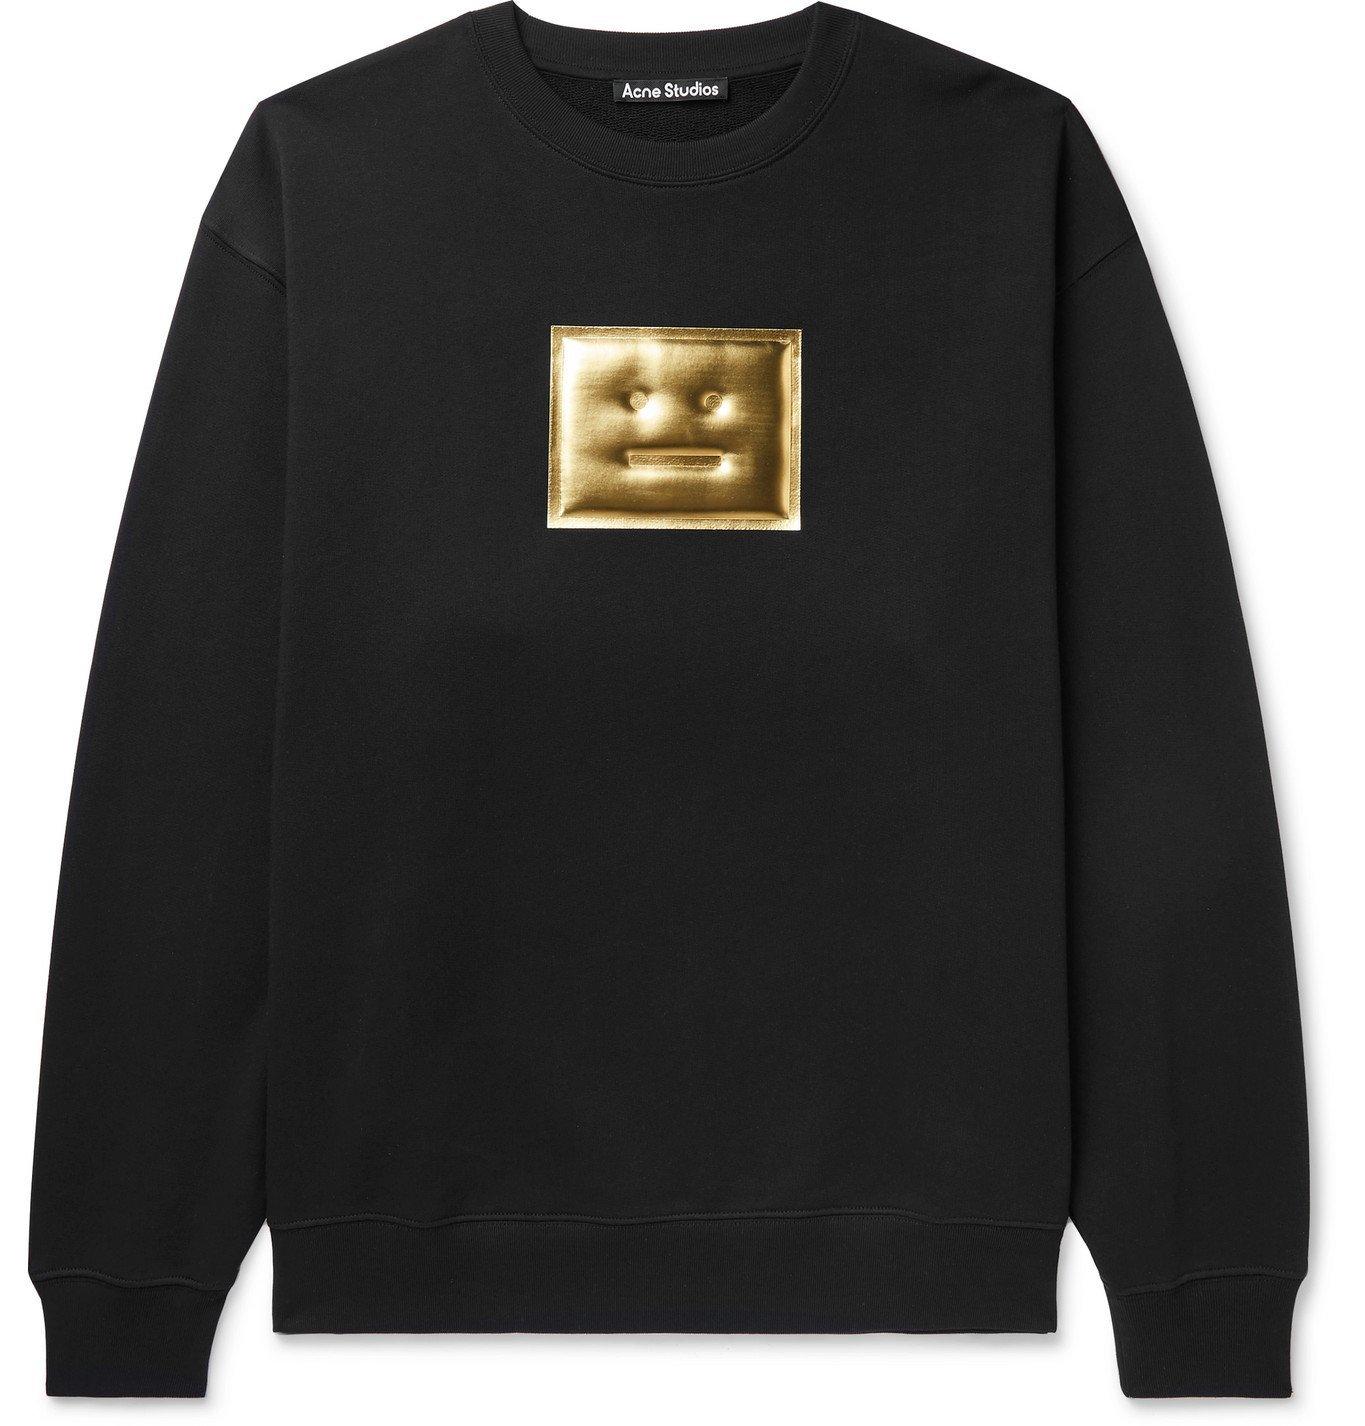 ACNE STUDIOS - Forba Oversized Iridescent Logo-Detailed Loopback Cotton-Jersey Sweatshirt - Black